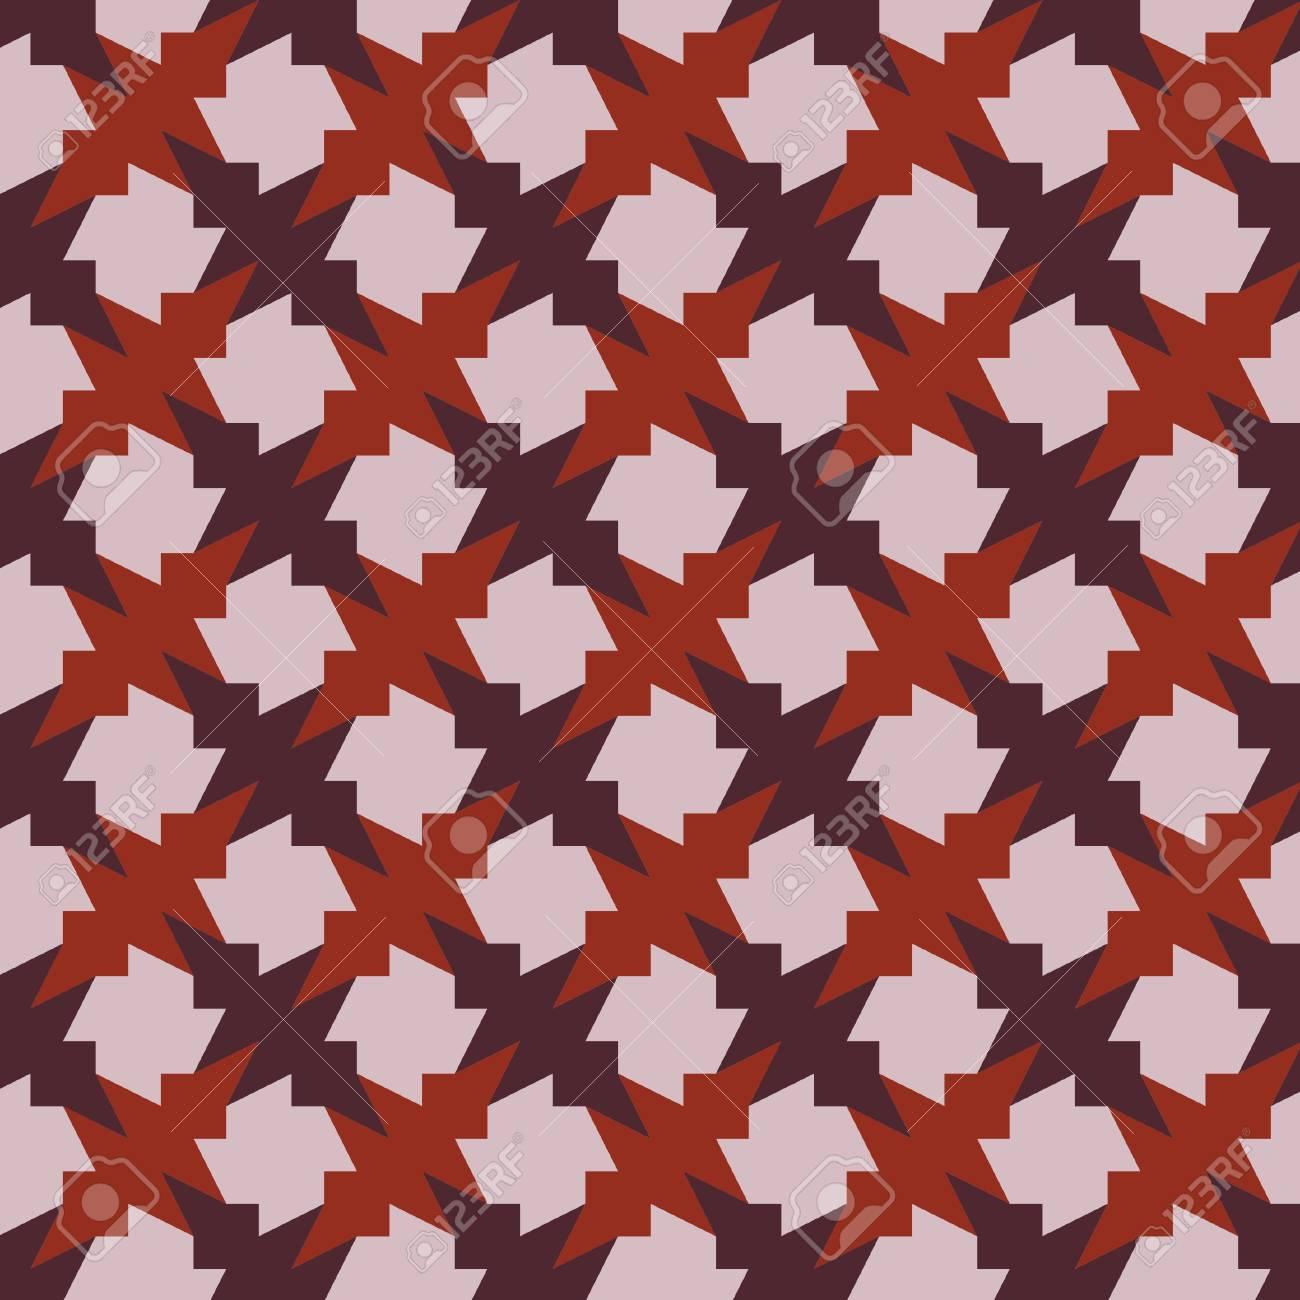 sound wave seamless pattern - 110725915